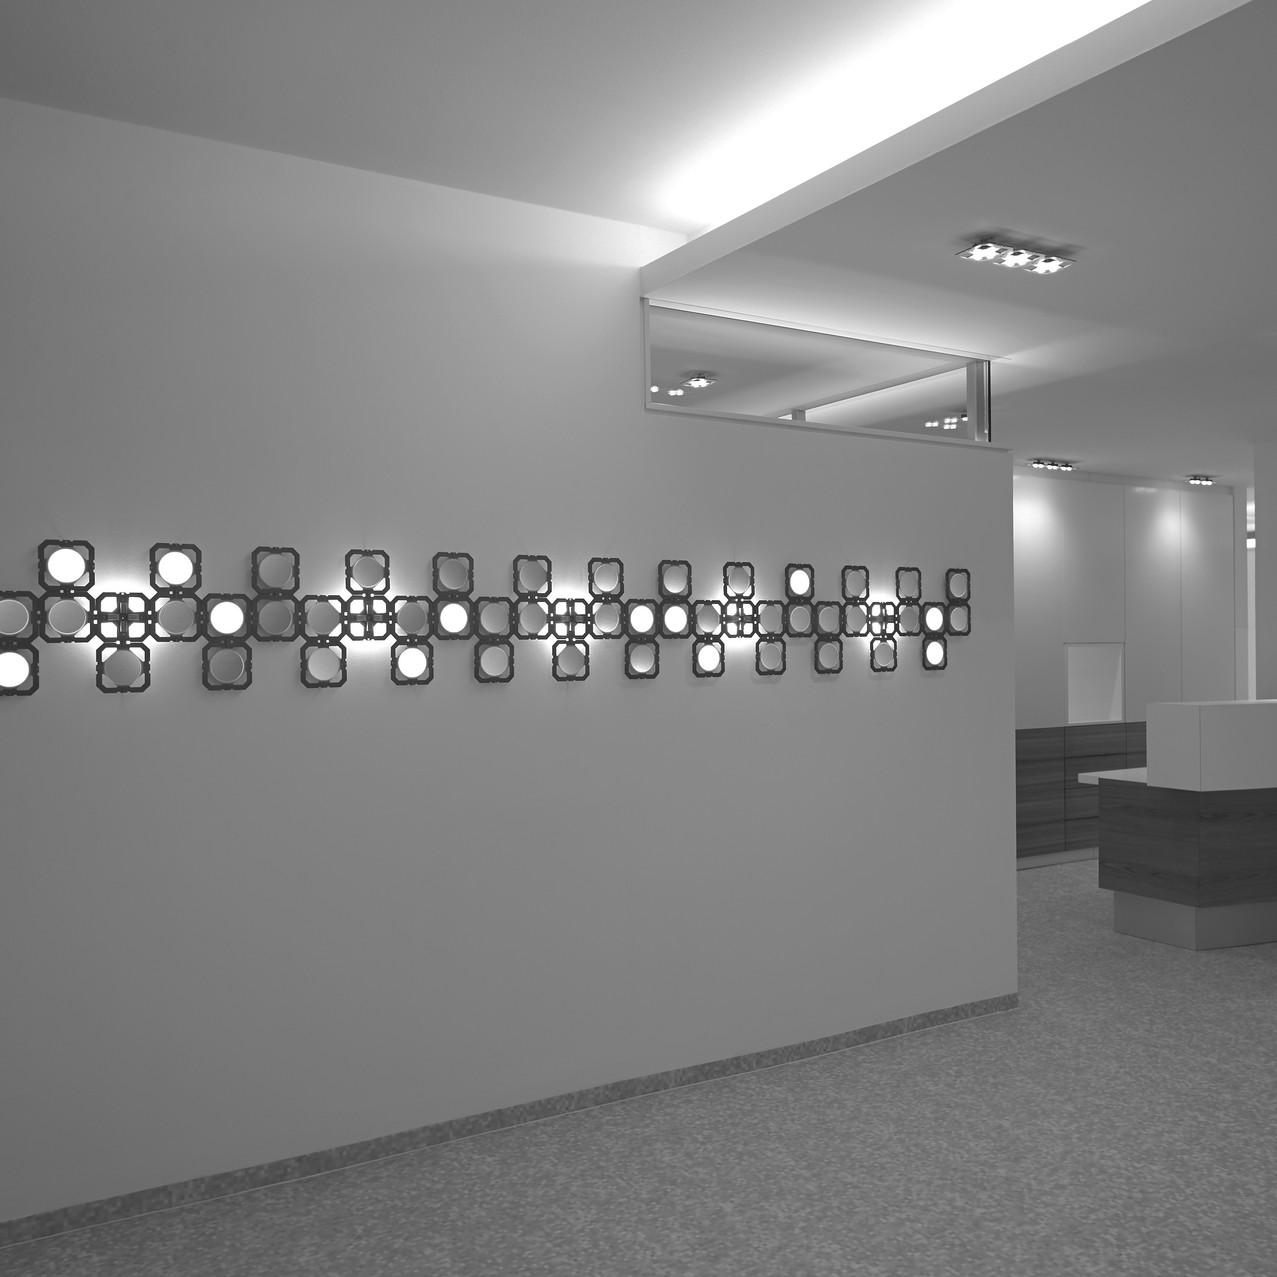 LED_OLED_Installation_Foto_Andreas_Reitersw-einpaaran